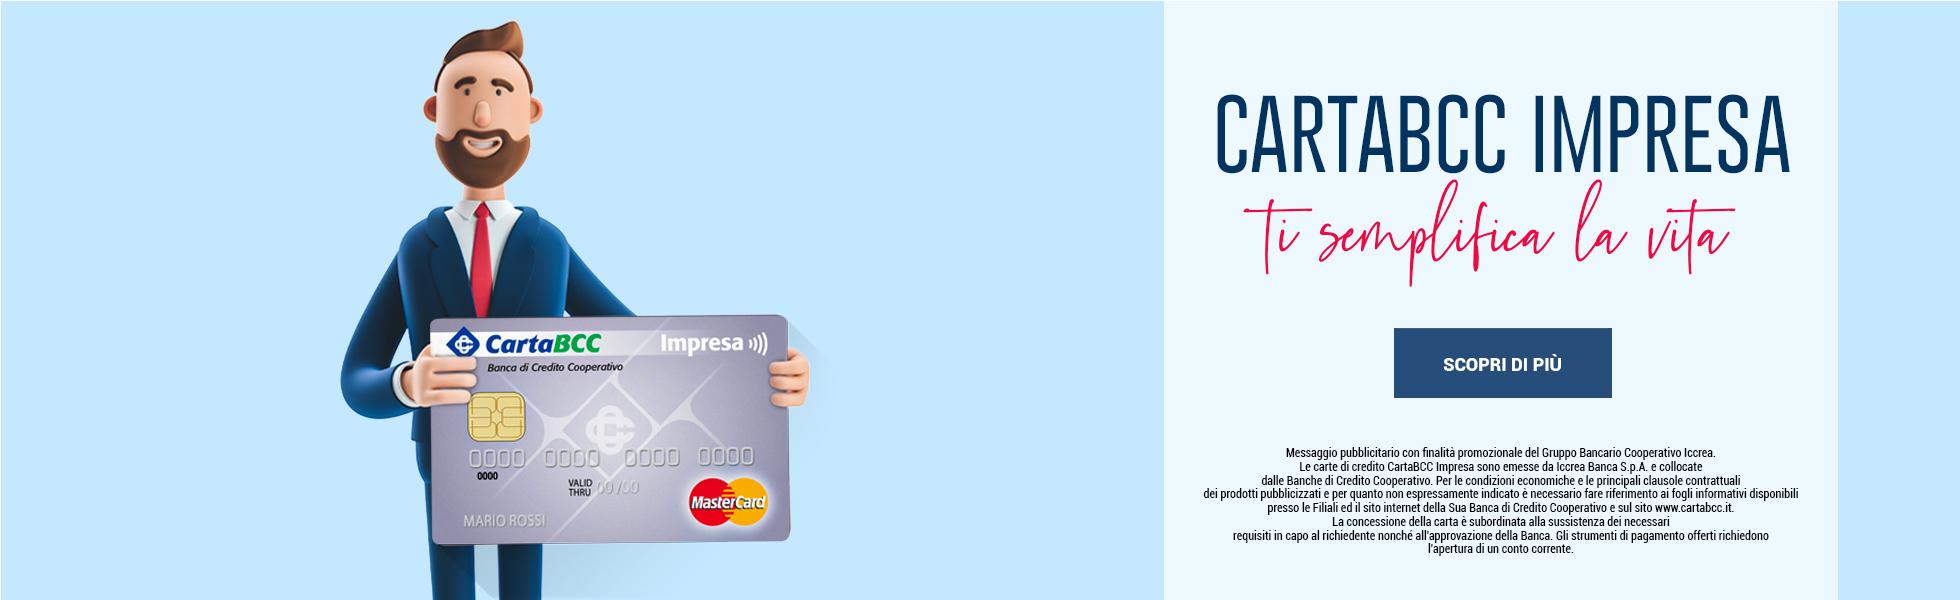 CartaBCC Impresa_2020